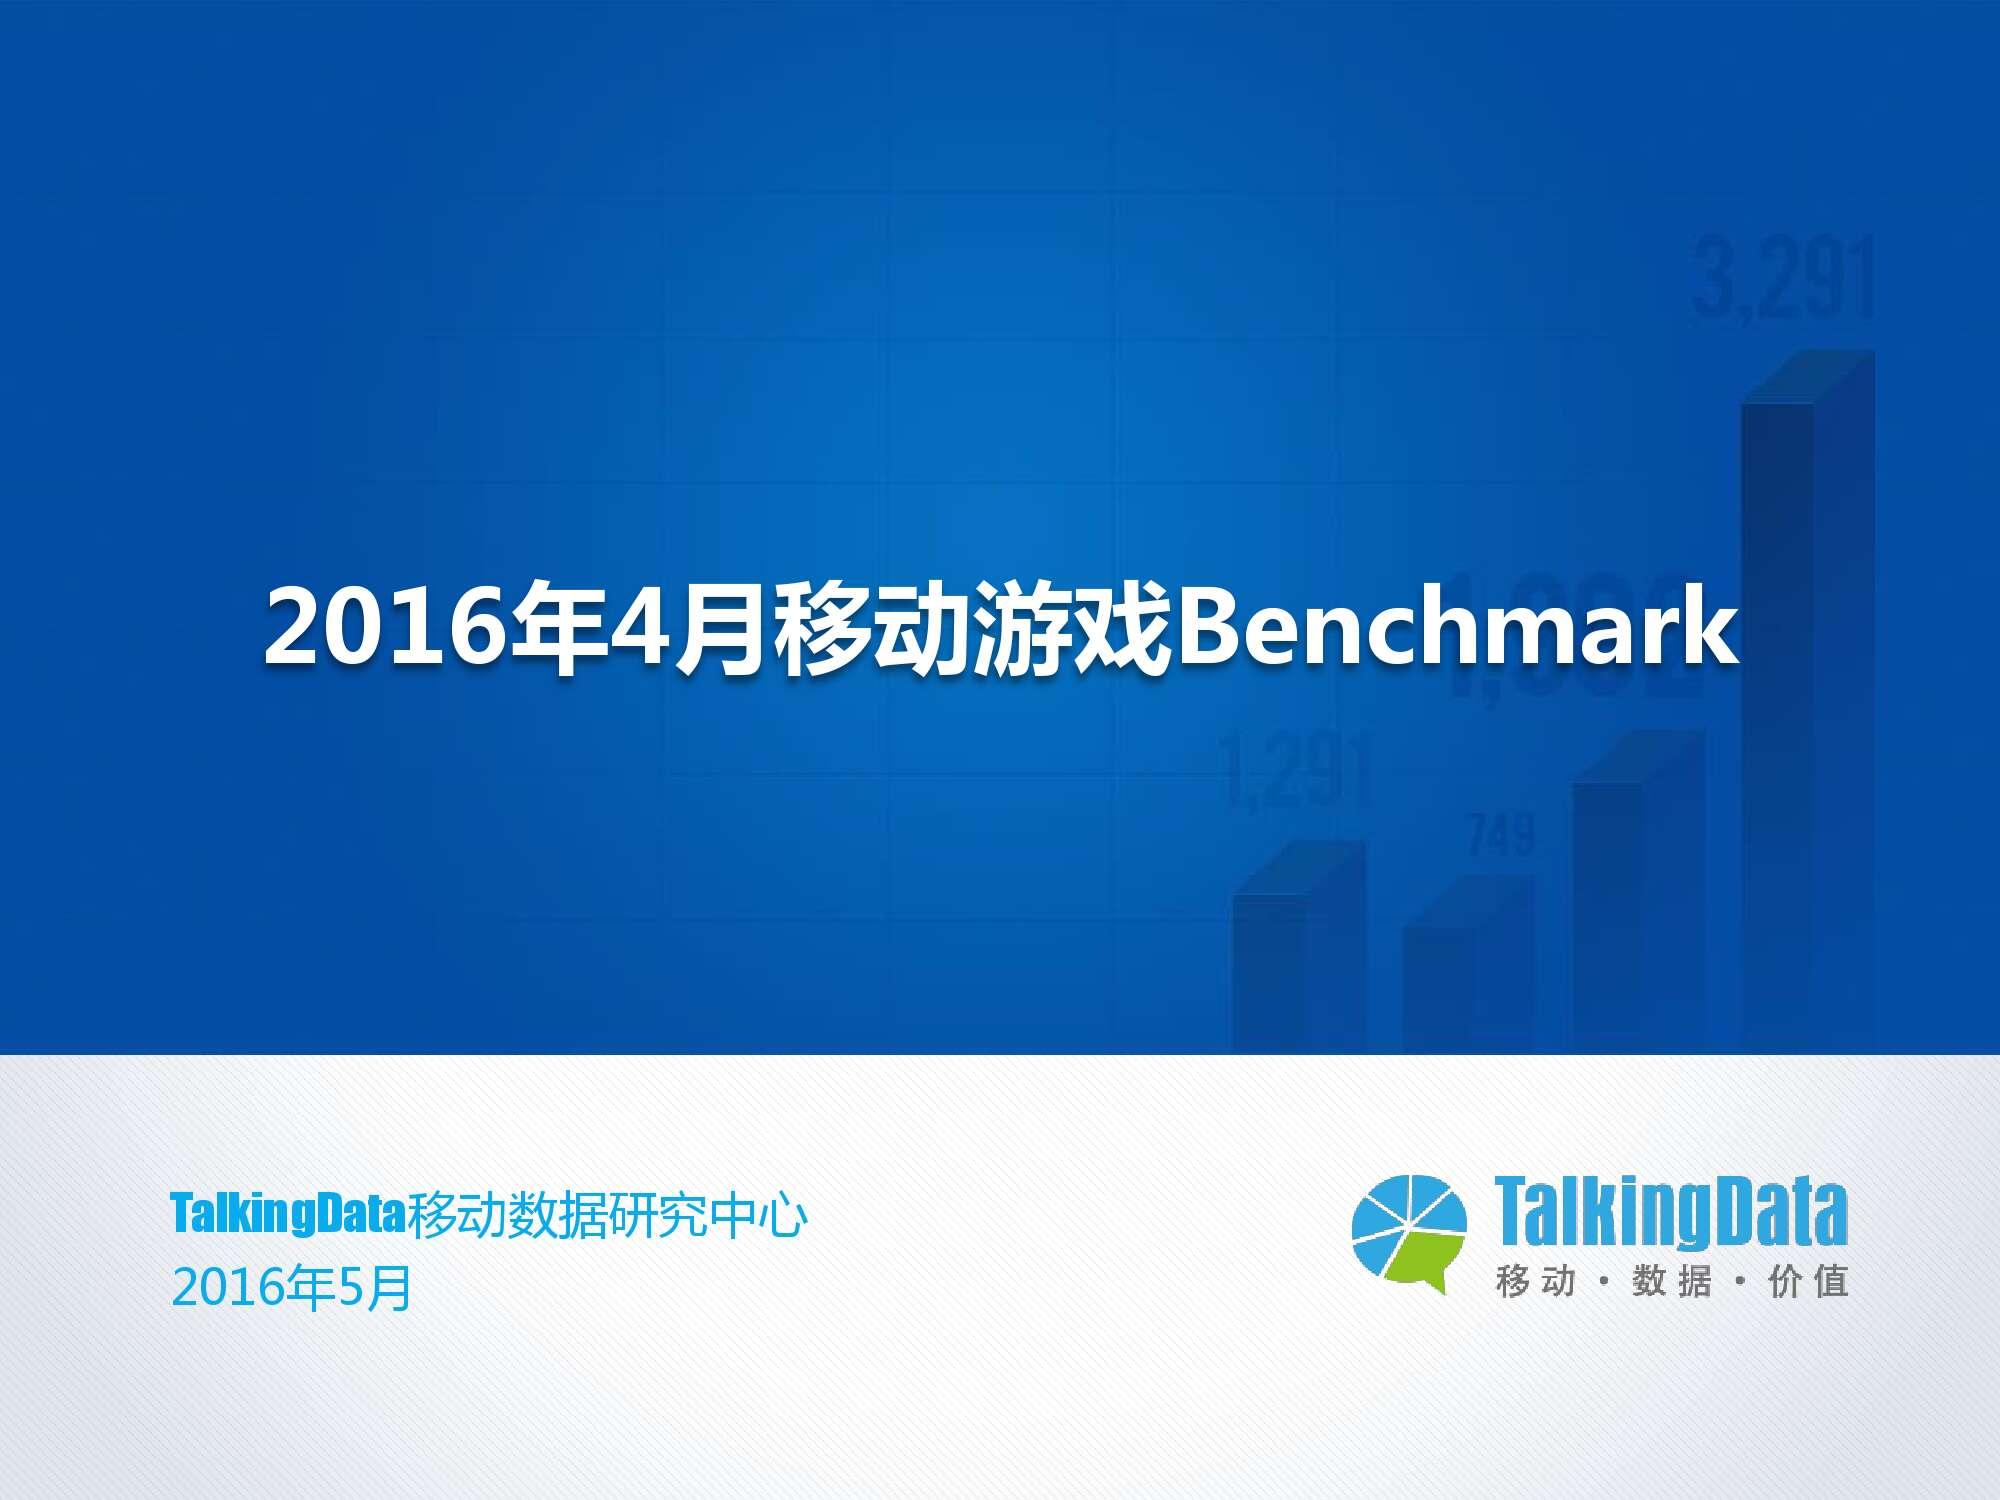 TalkingData-2016年4月移动游戏Benchmark指标数据_000001